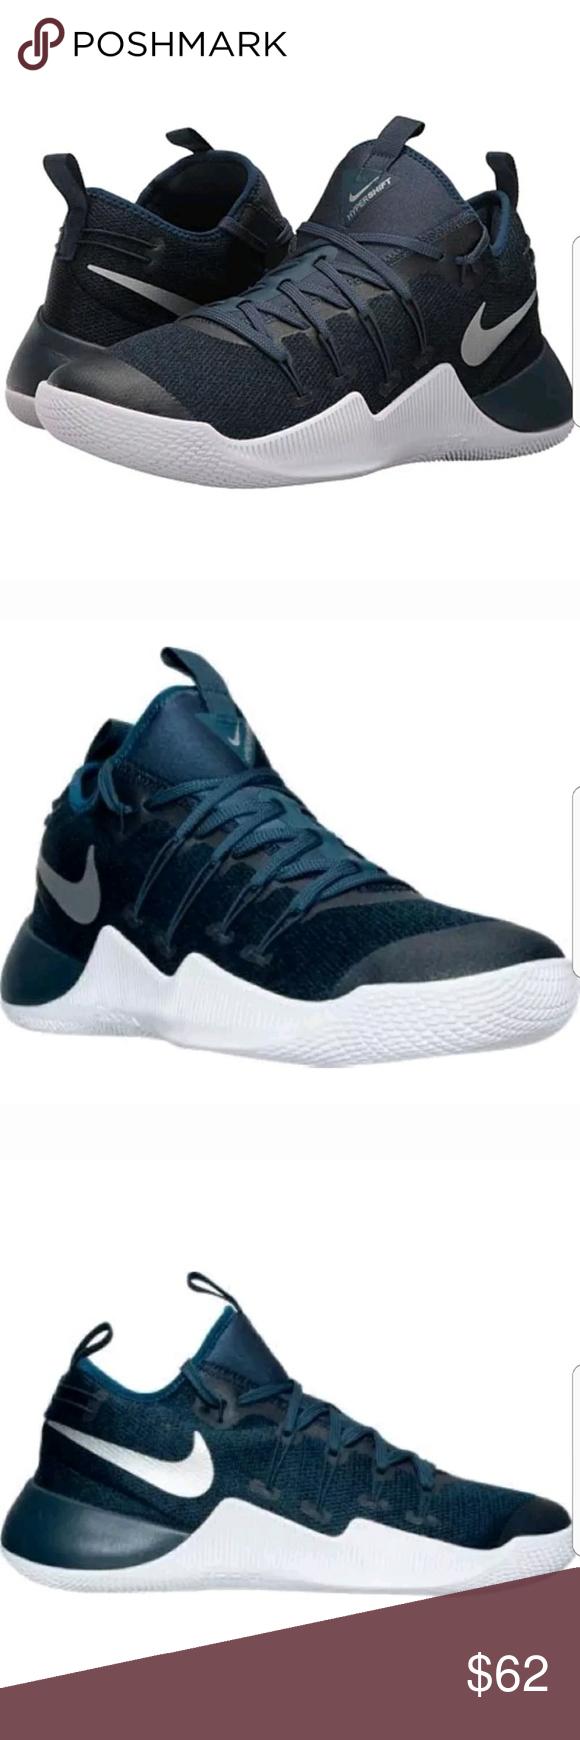 check out 019da e83a3 Nike Hypershift Basketball Blue 844369 410 NEW WITHOUT BOX Men s Nike  Hypershift Basketball Shoe Squadron Blue Metallic Silver White 844369-410  Shoot me ...